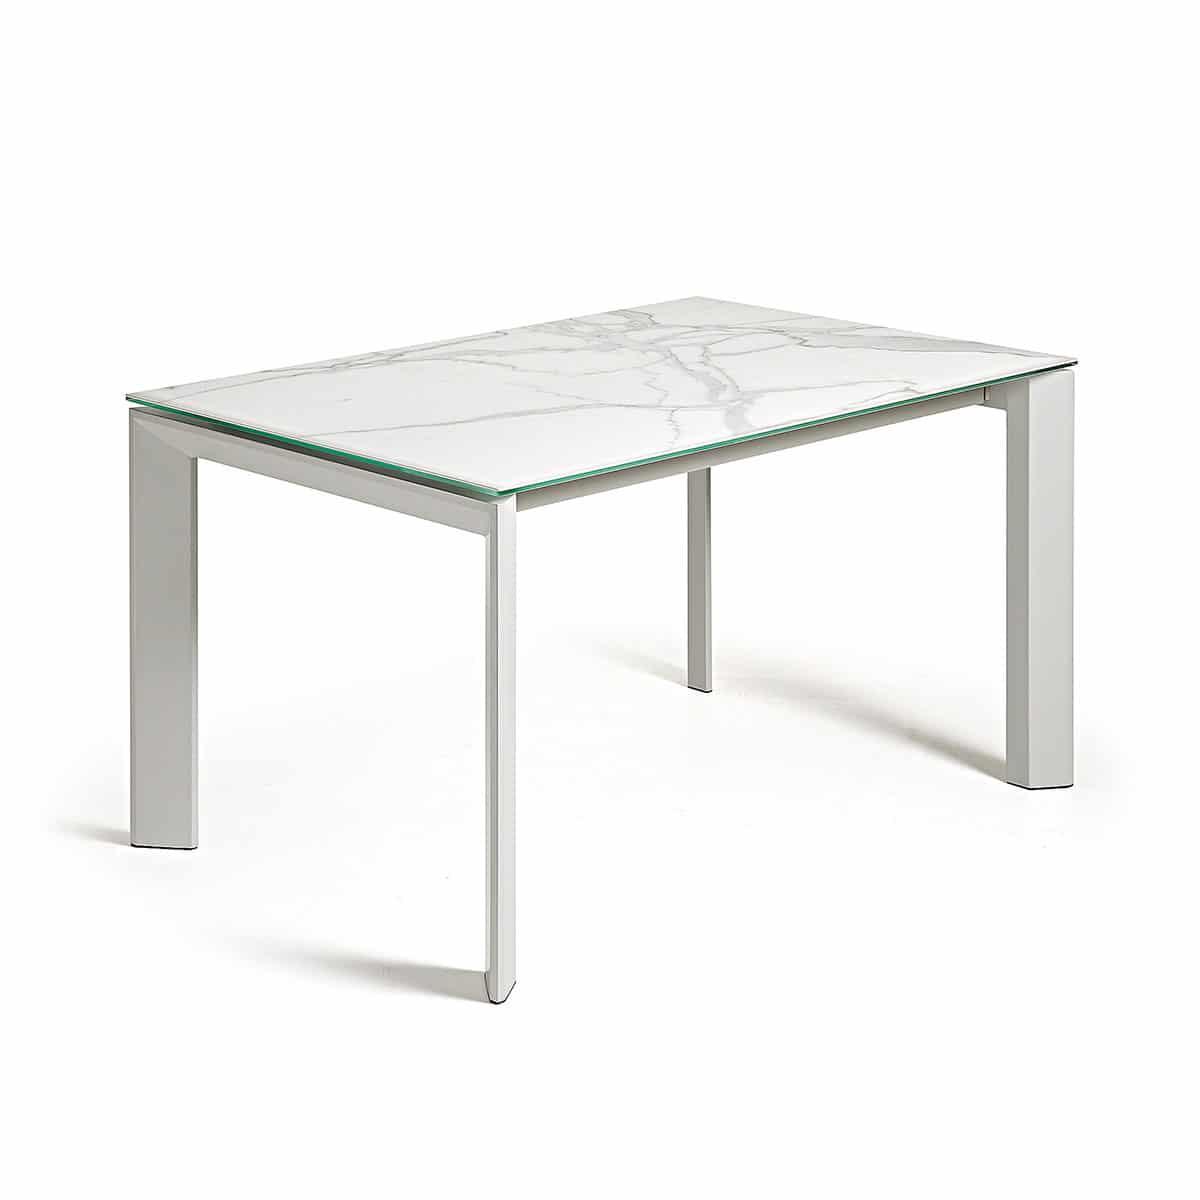 Mesa comedor marmol gris - Artikalia - Muebles de diseño